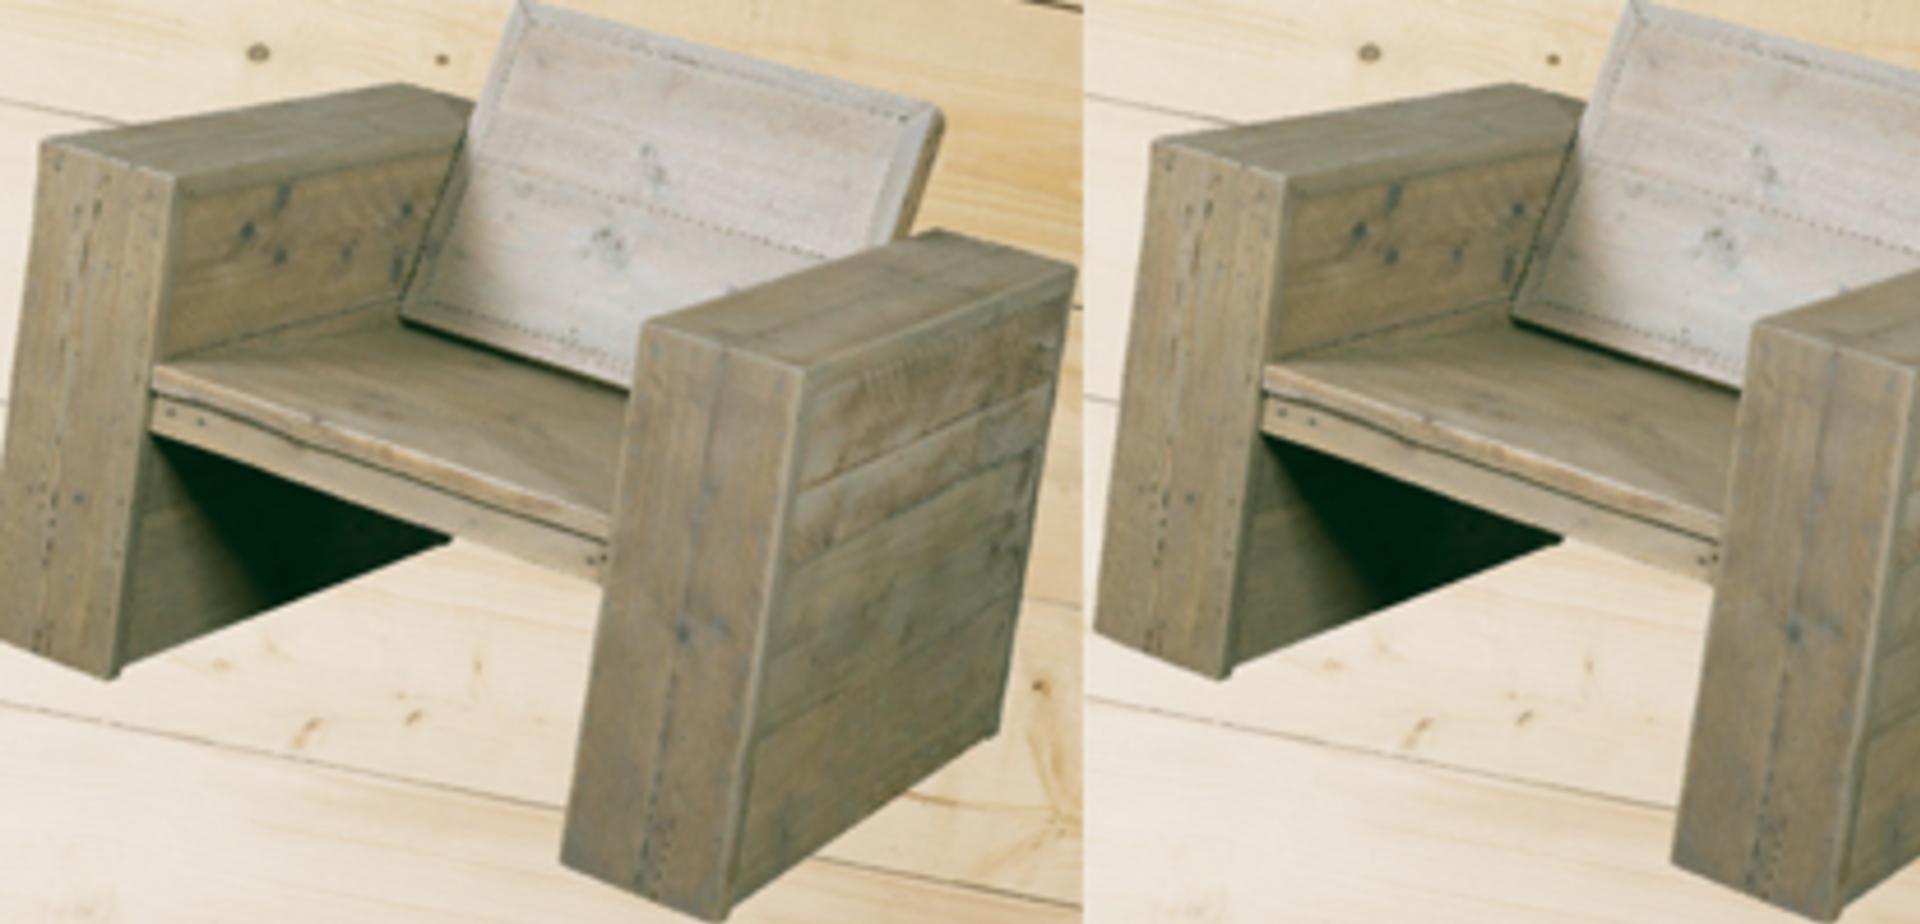 Stoel van steigerhout maken for Steigerhout praxis